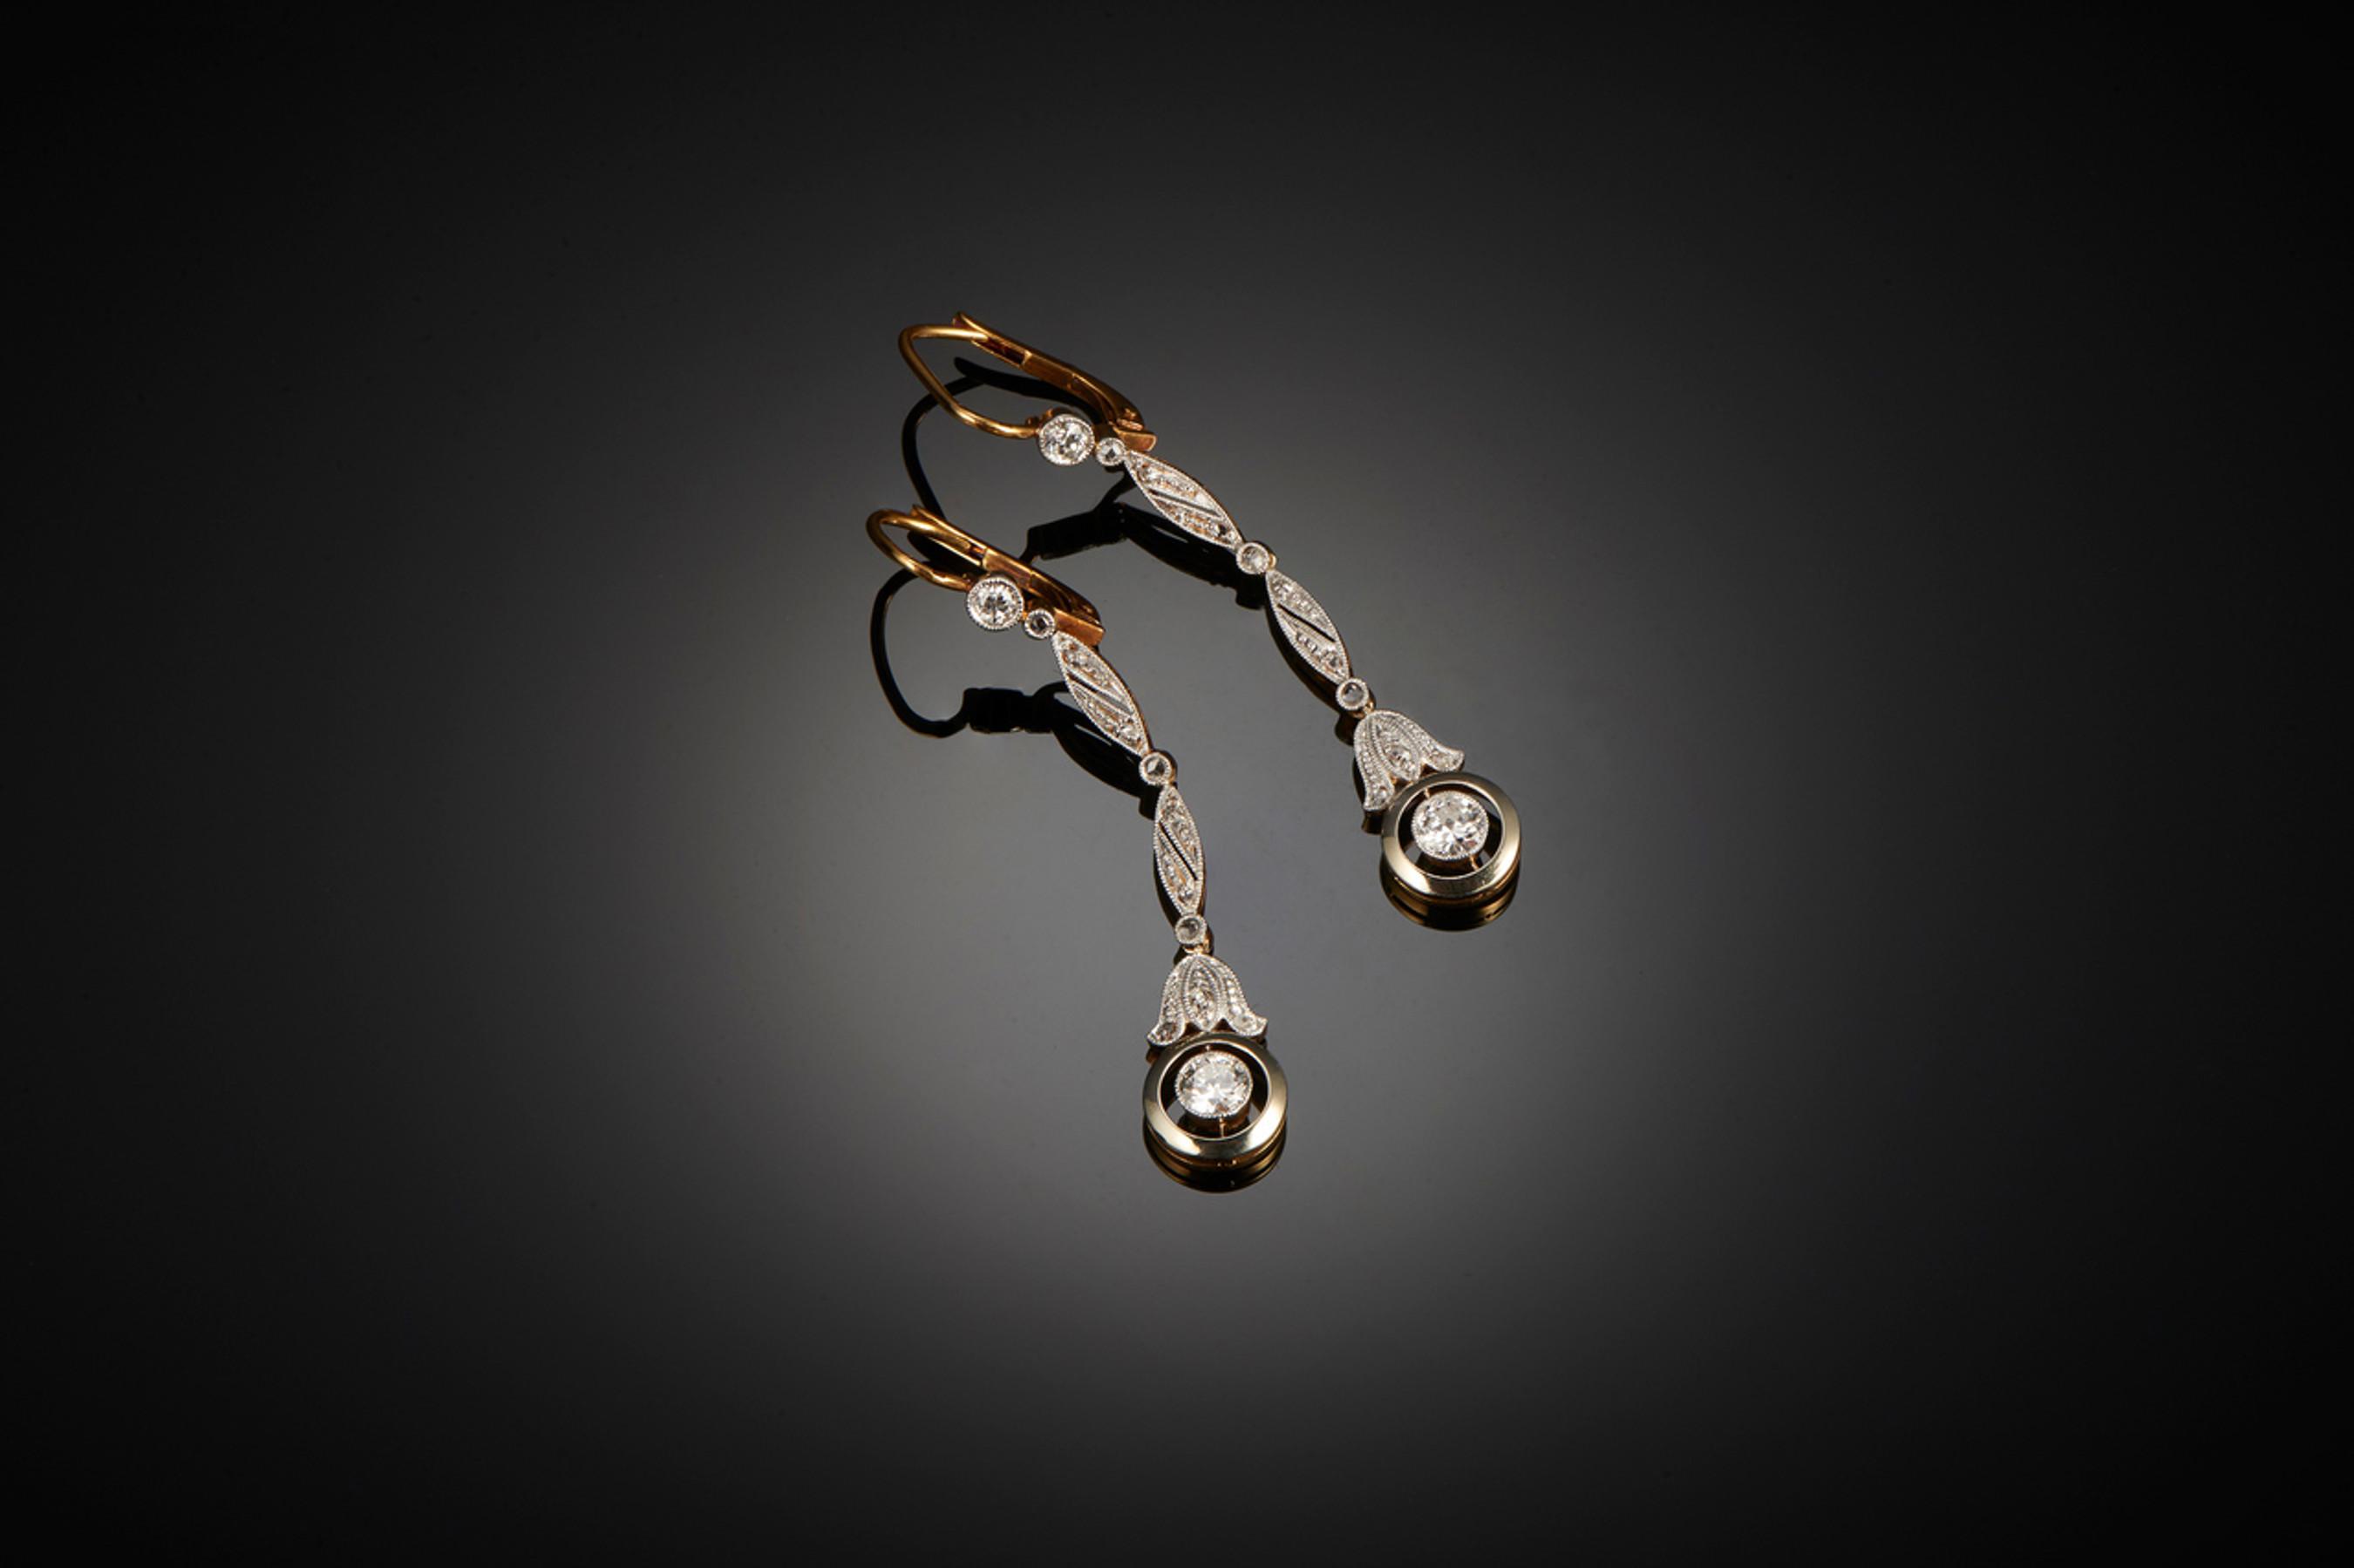 Glamorous Pair of Diamond Pendant Earrings - Front Image